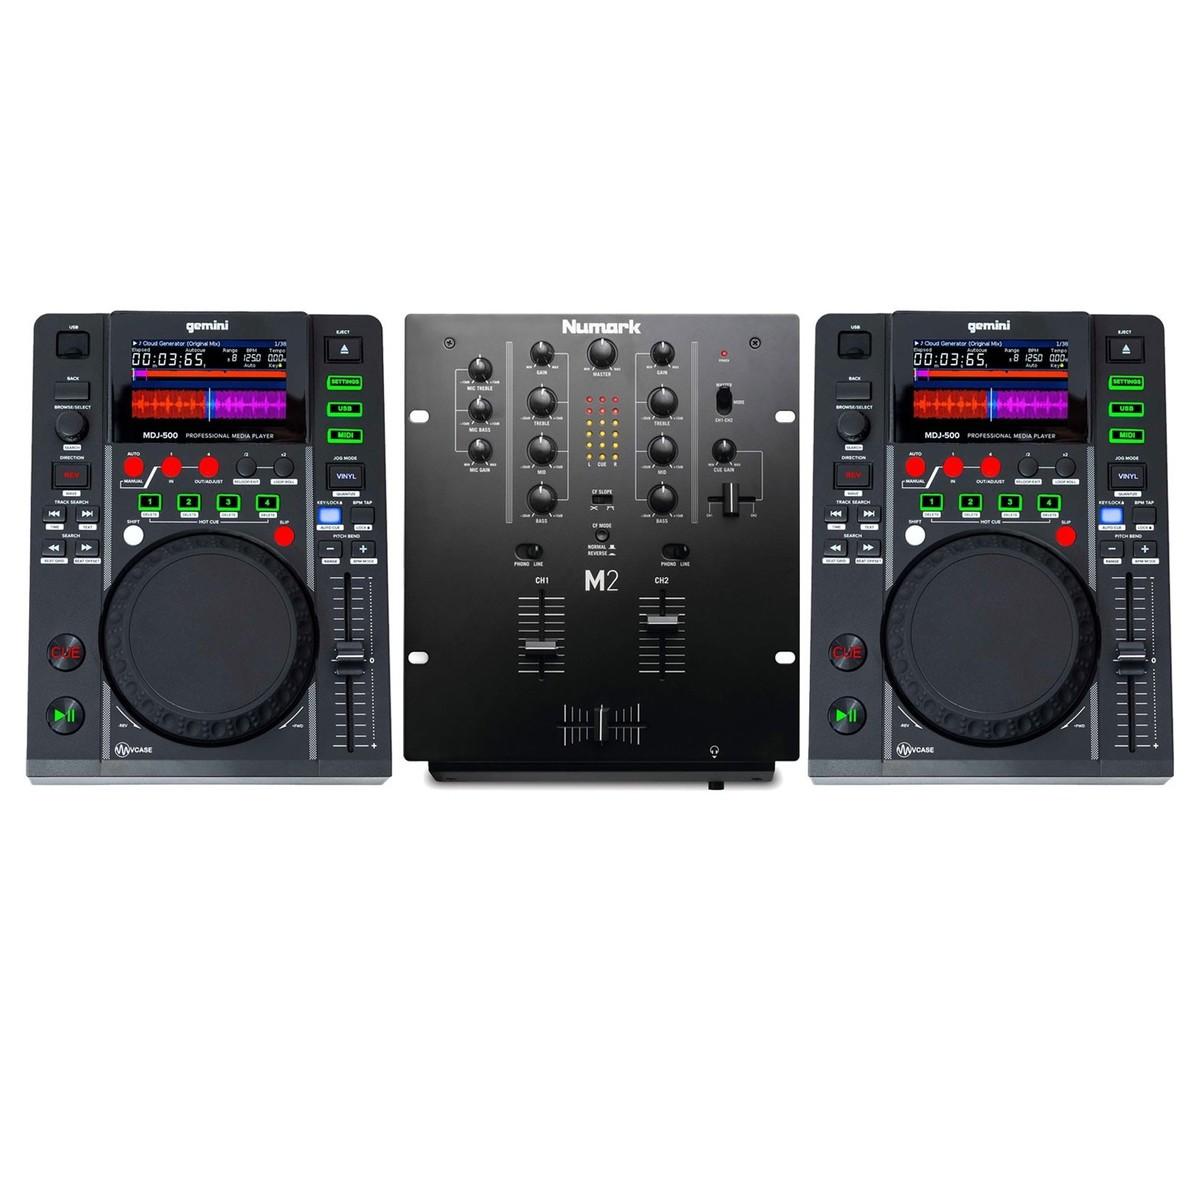 Mutta Kanaal Songs Mp3: Gemini MDJ-500 And Numark M2 Bundle